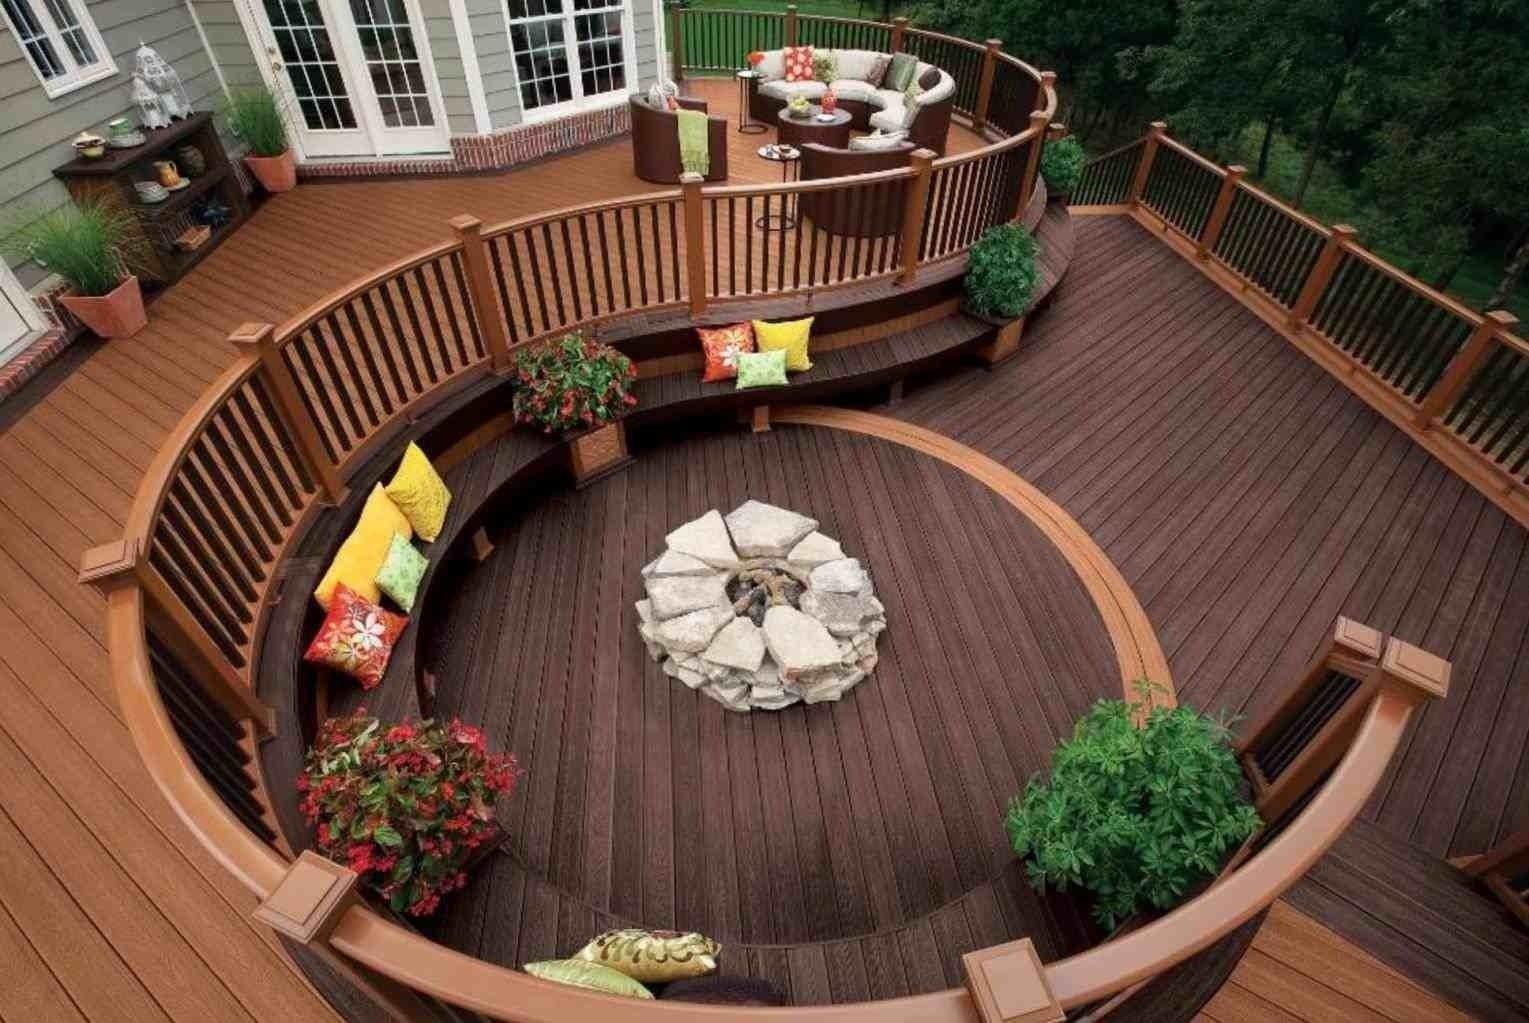 10 Stylish Deck Ideas With Fire Pit successful deck fire pit ideas pinterest djkambennettgraphics deck 2021